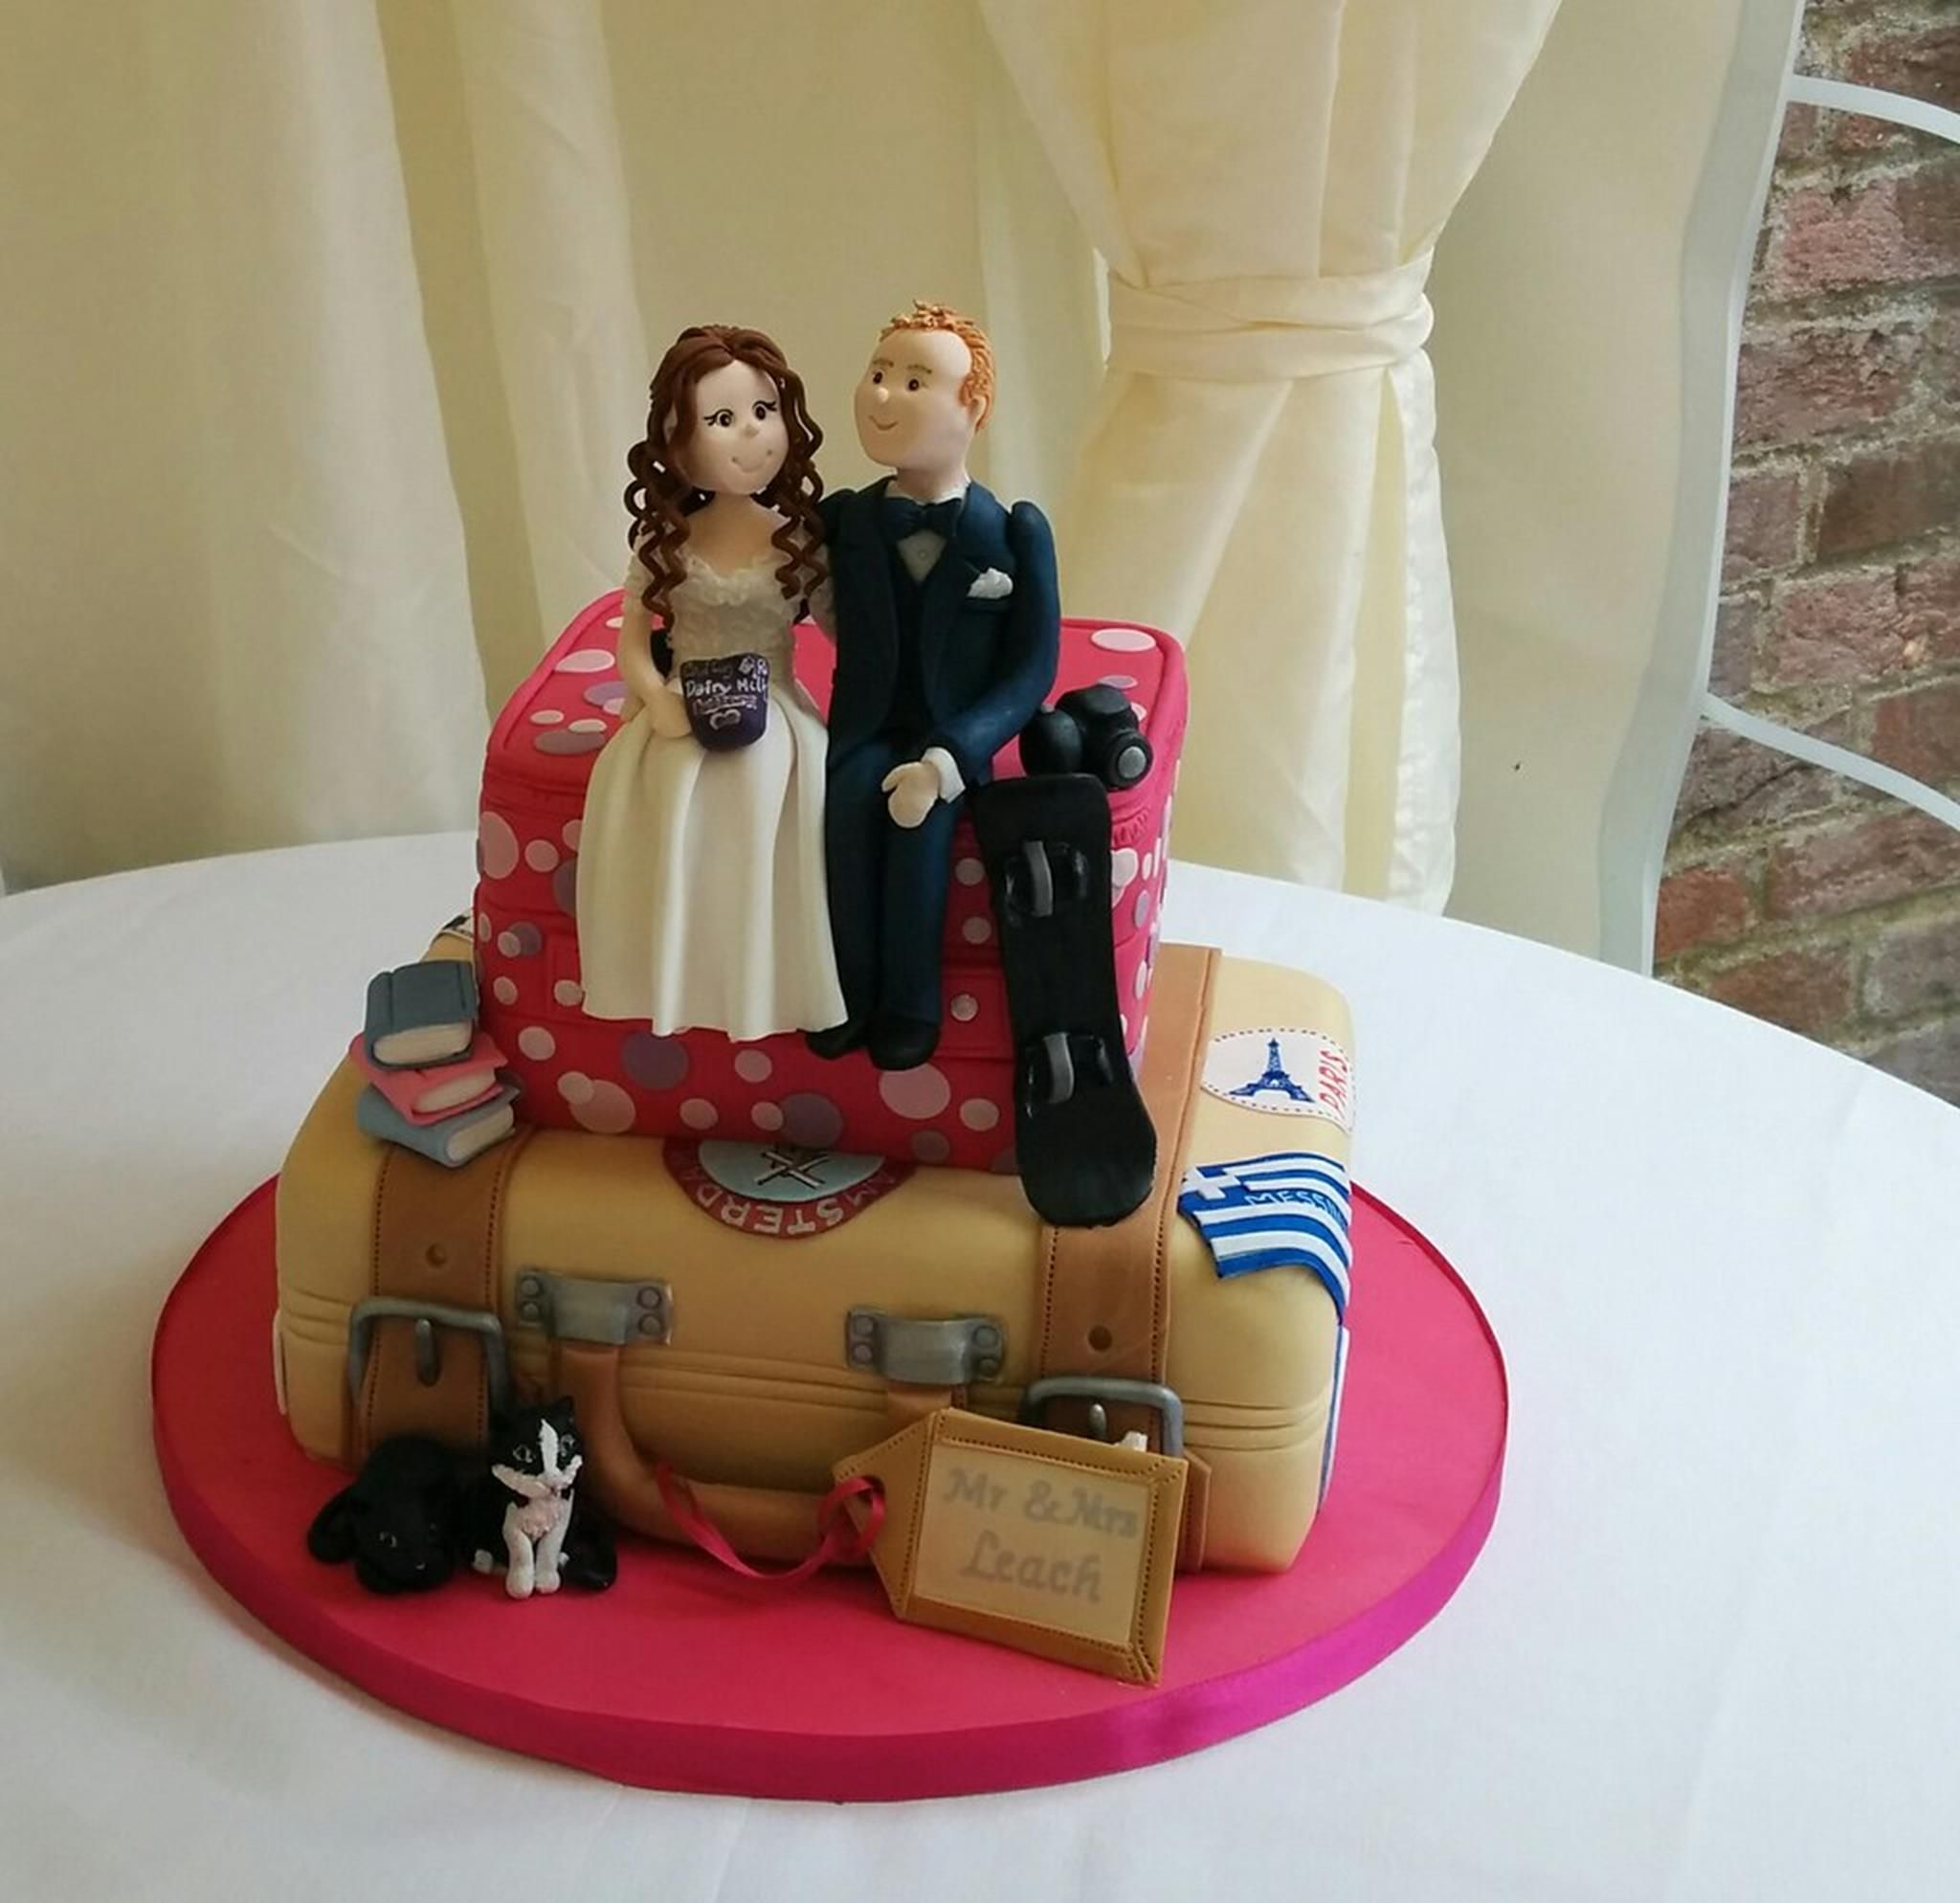 Wedding Cake Accessories In 2020 Wedding Cakes Wedding Cake Accessories Wedding Cake Prices